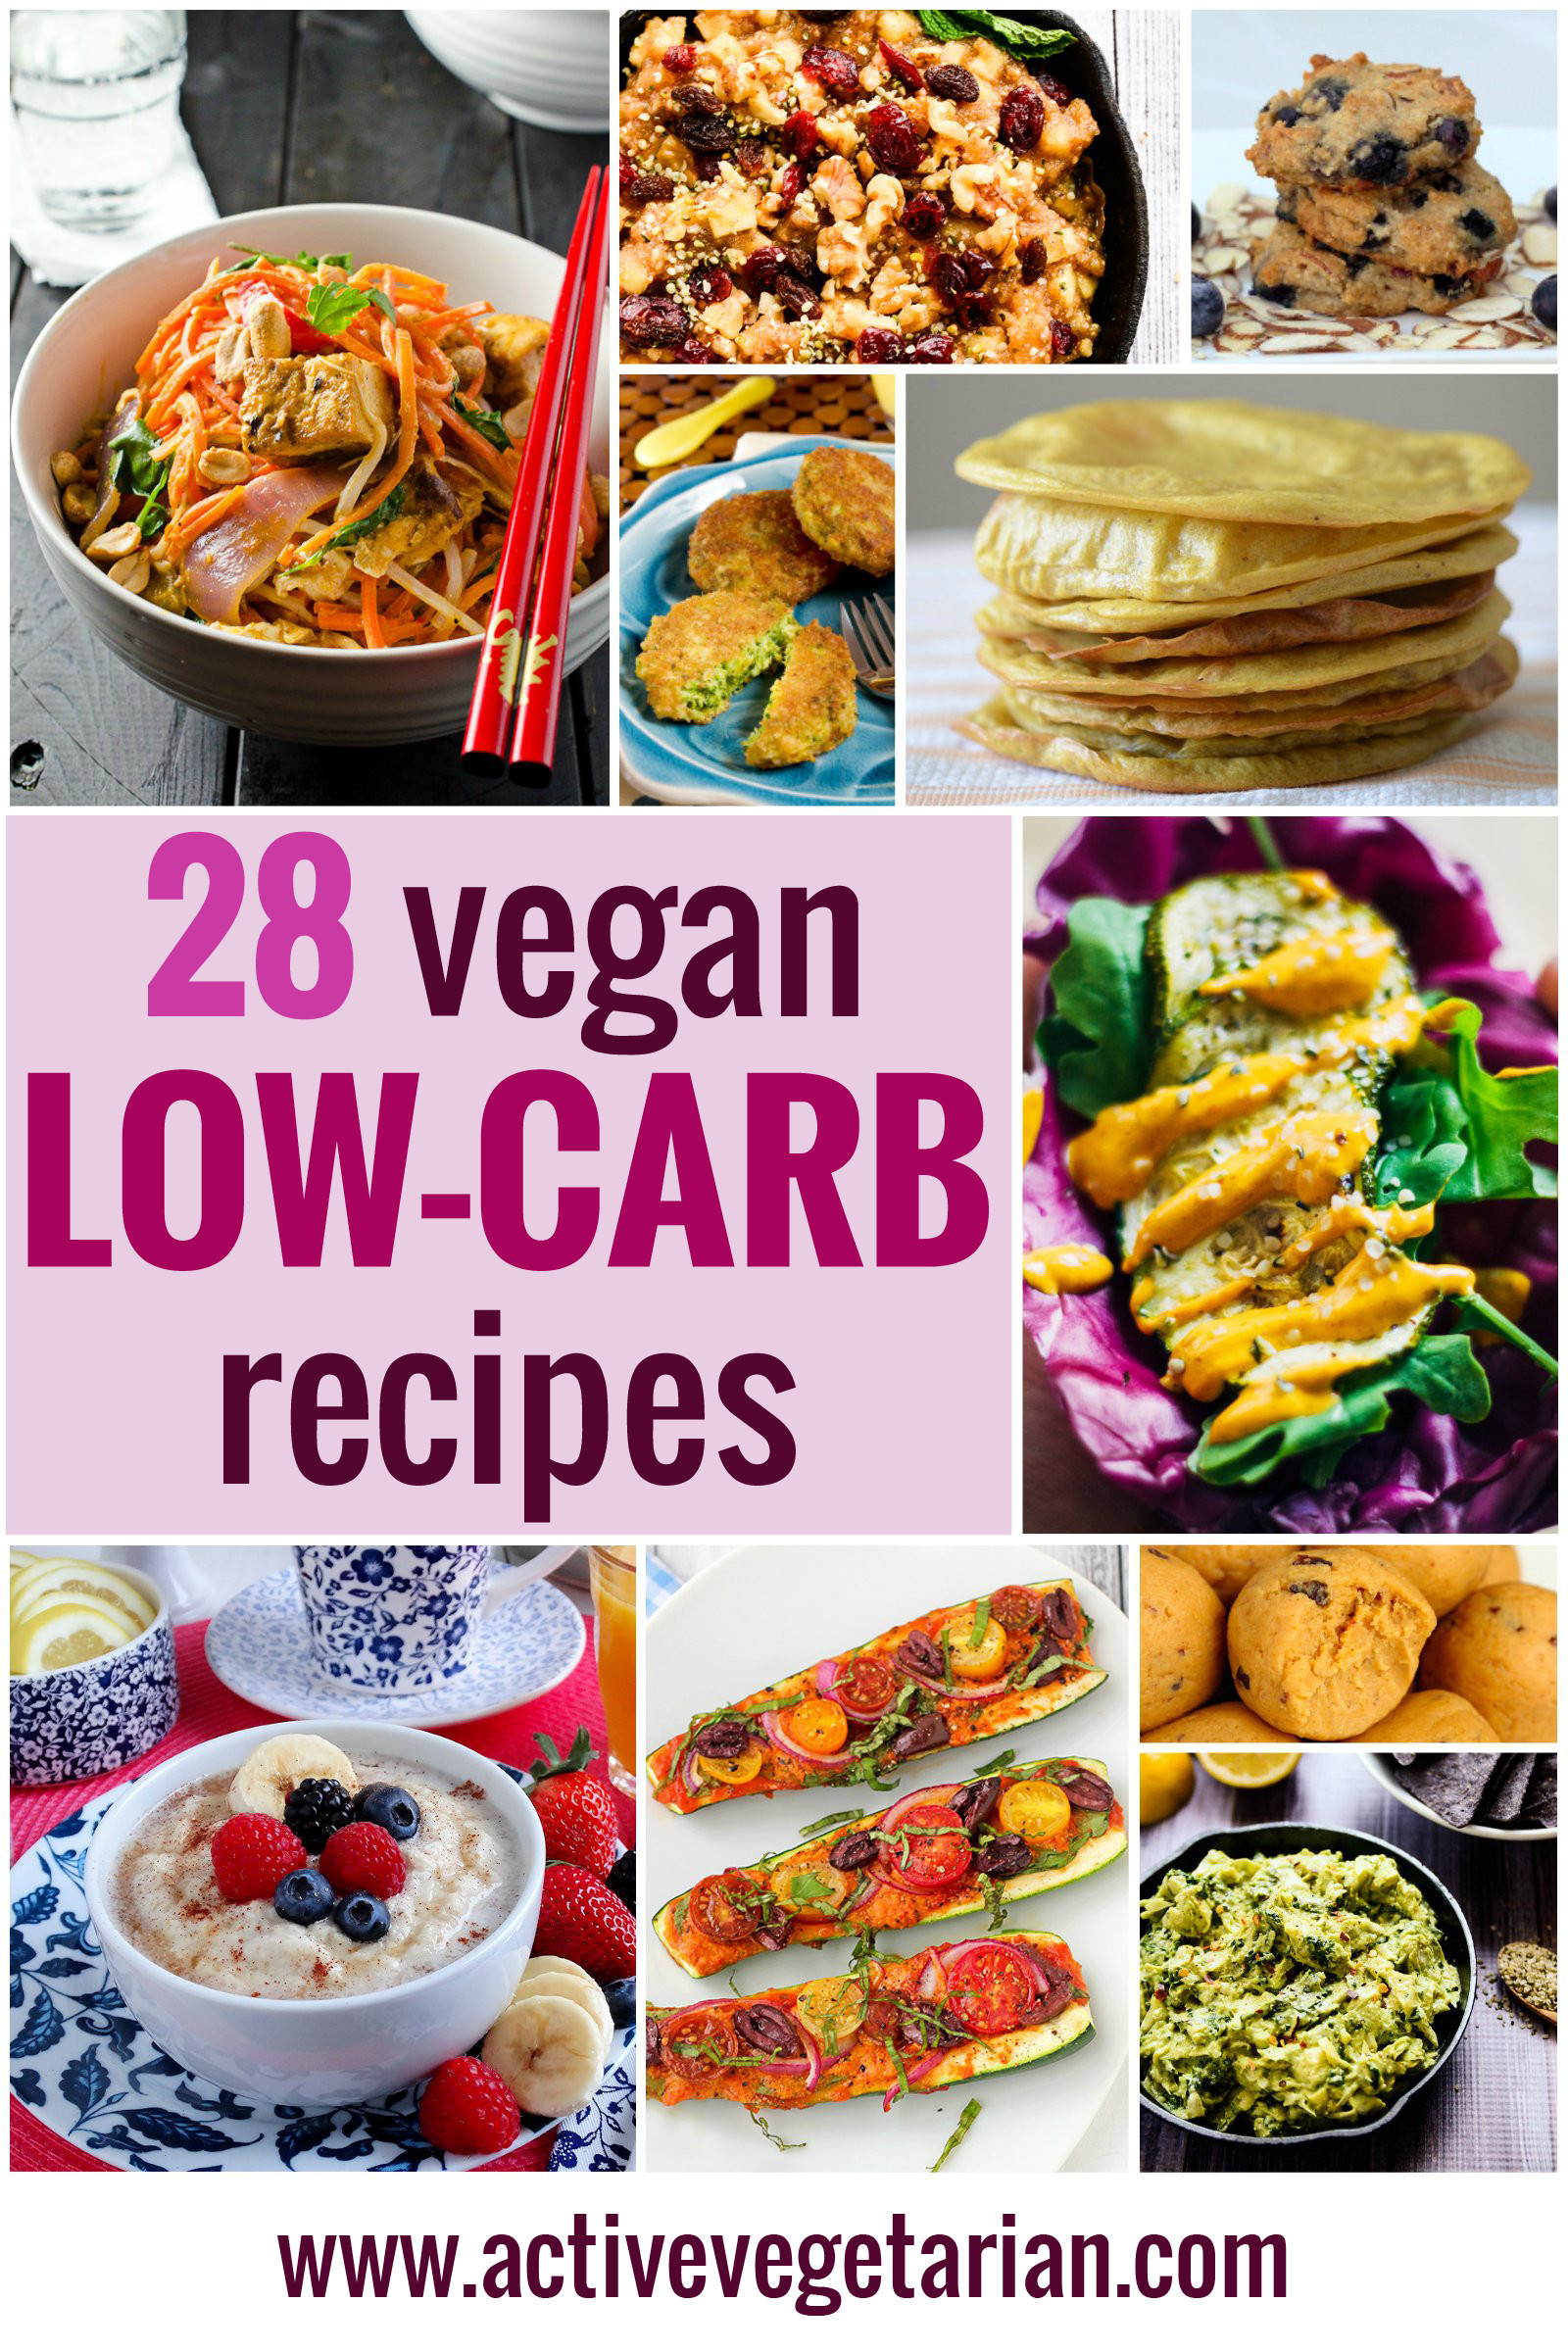 Low Carb Vegan Recipes  Recipe Round Up – 28 Low Carb Vegan Recipes